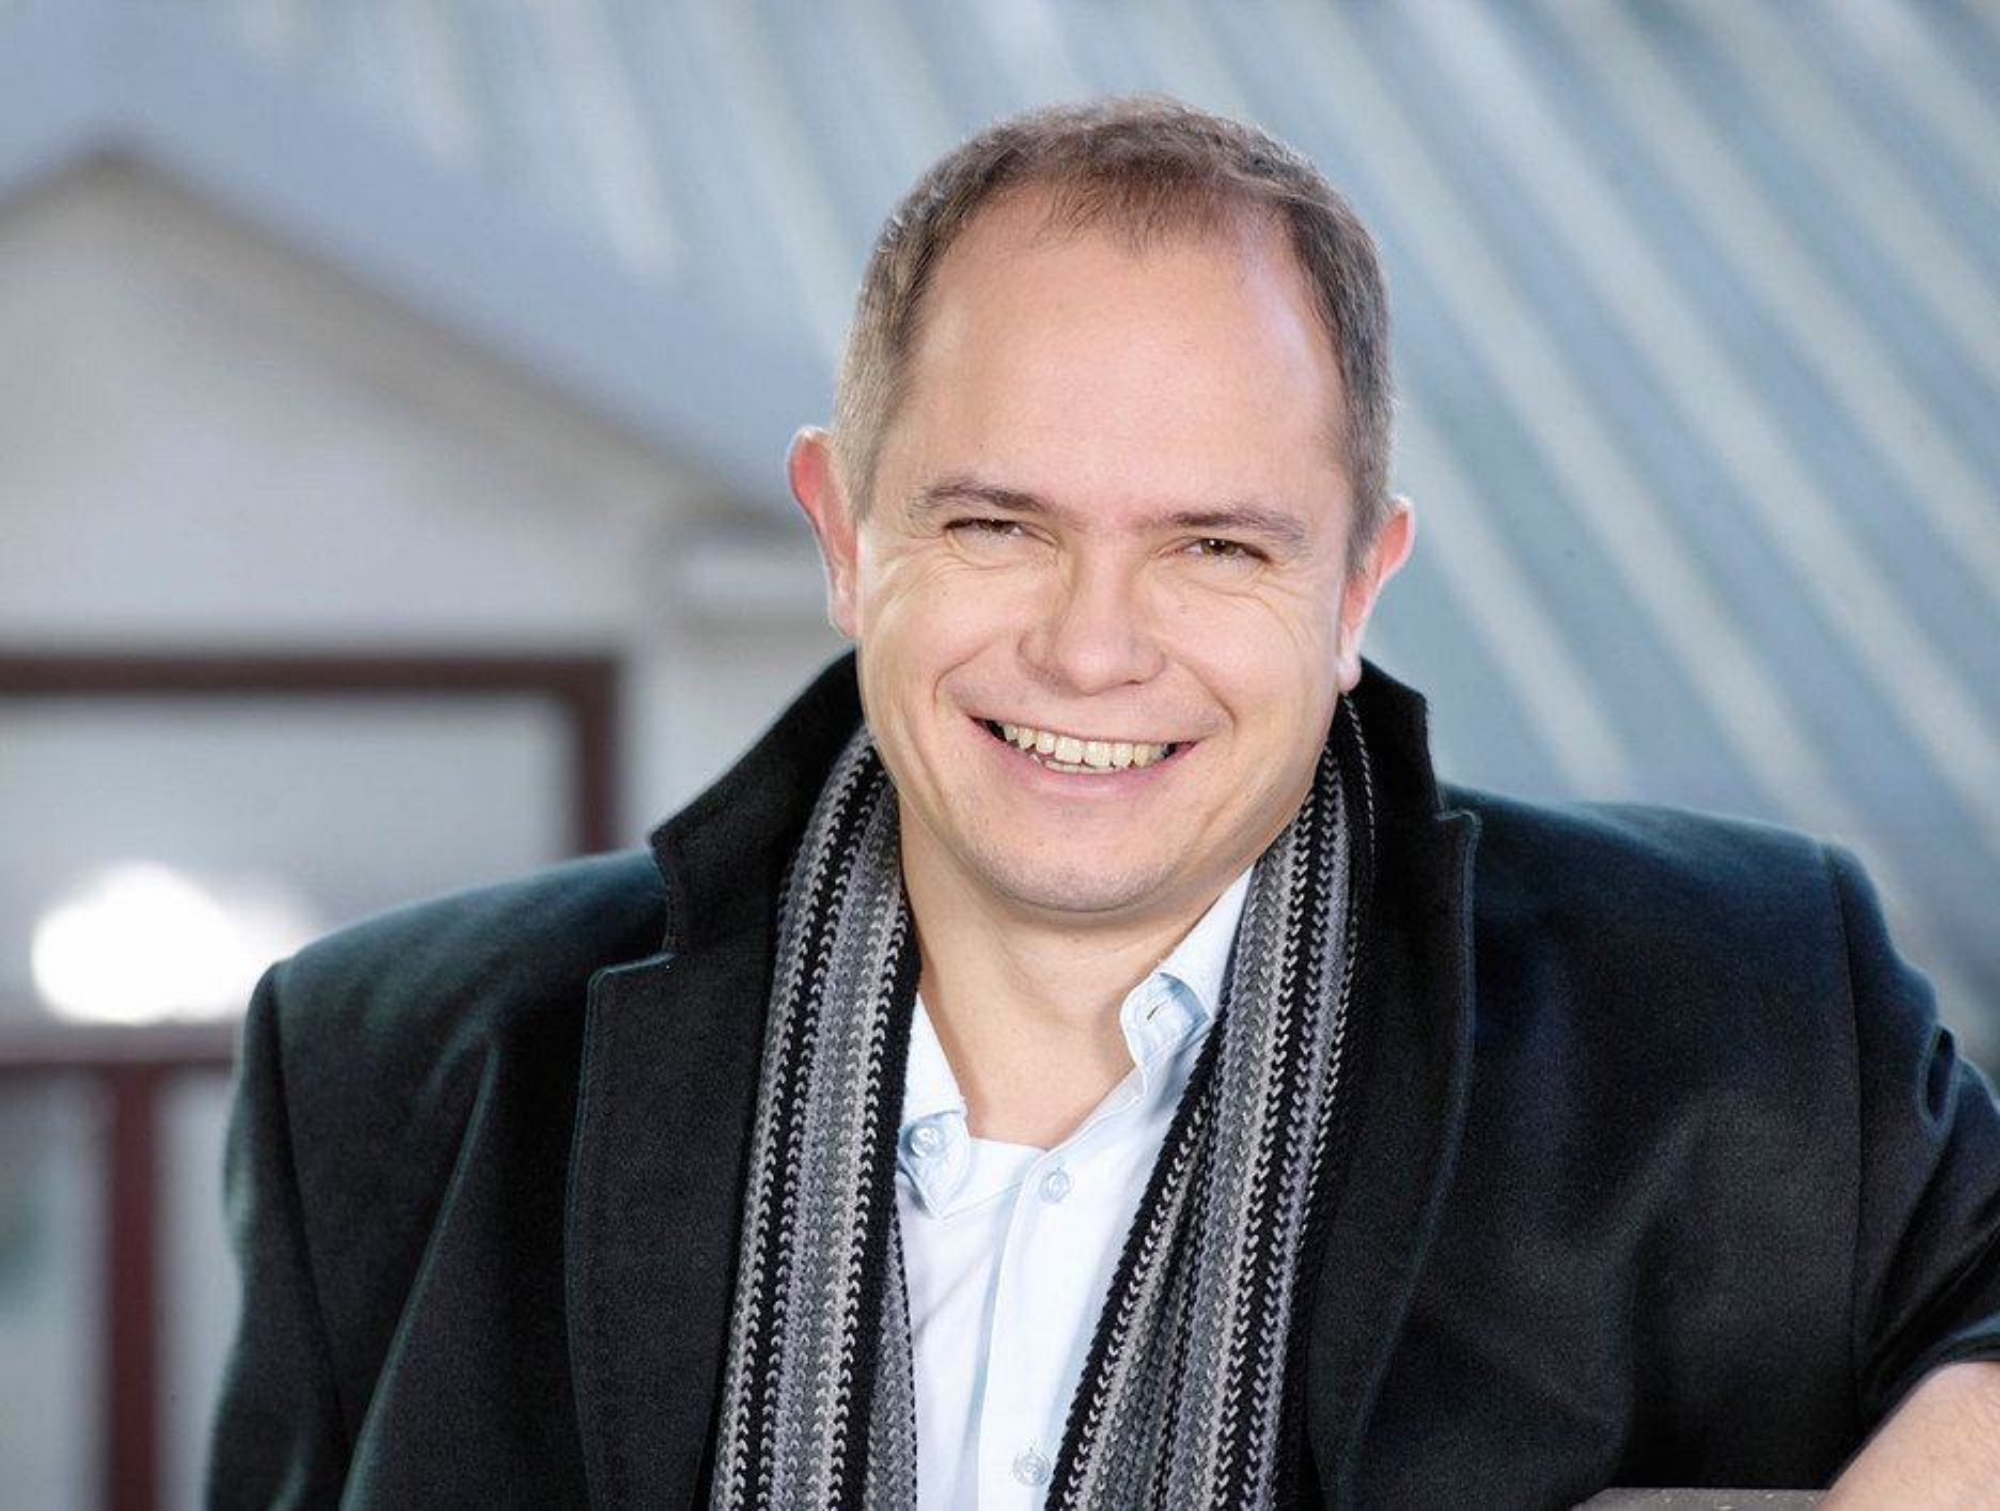 TILFREDS: - Bransjen har lenge ønsket seg et skifte til ny kringkastingsteknologi, sier en tilfreds daglig leder Ole Jørgen Torvmark i Digitalradio Norge.